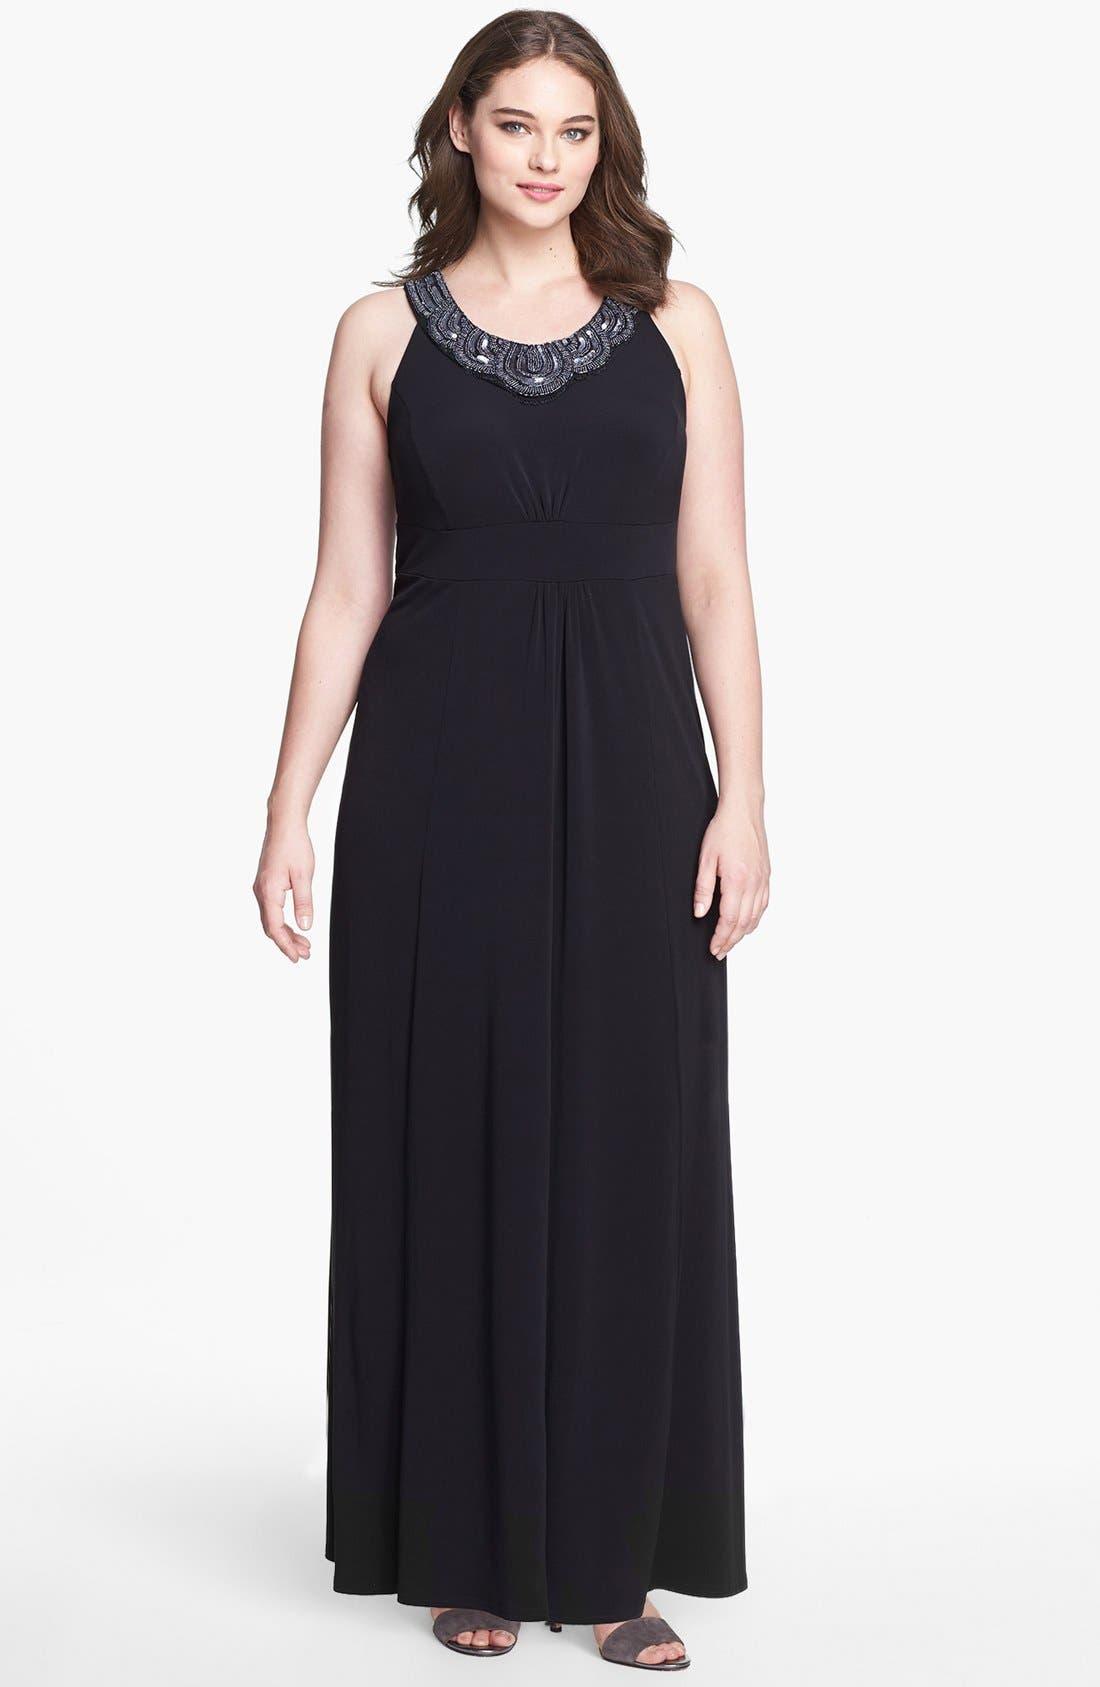 Main Image - Evans Embellished Jersey Maxi Dress (Plus Size)